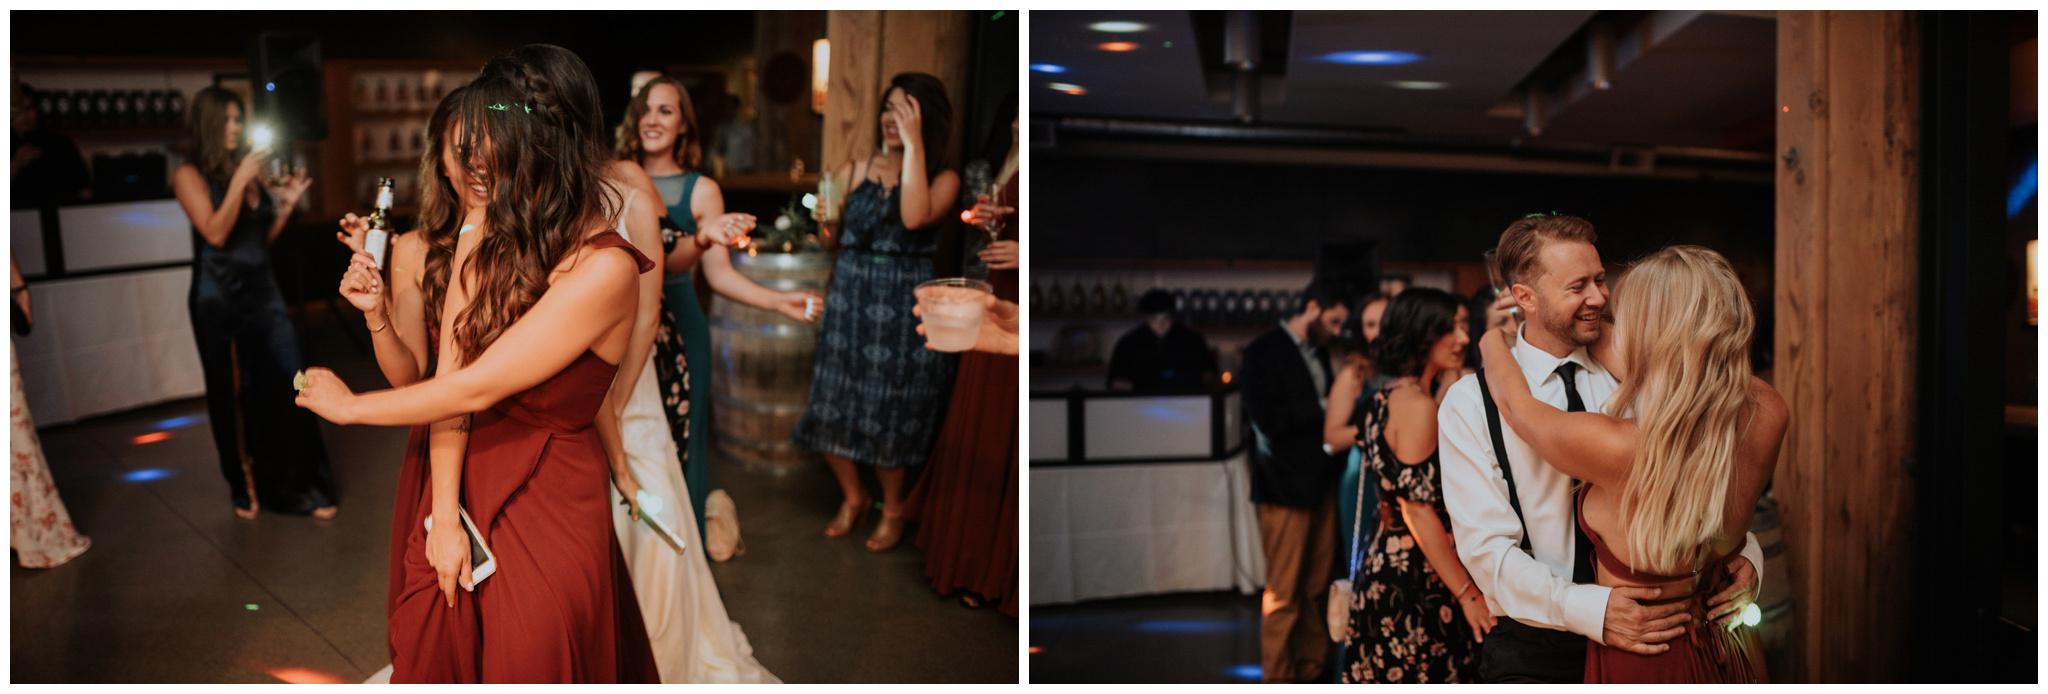 alyssa-keiran-westland-distillery-urban-seattle-wedding-photographer-caitlyn-nikula-162.jpg